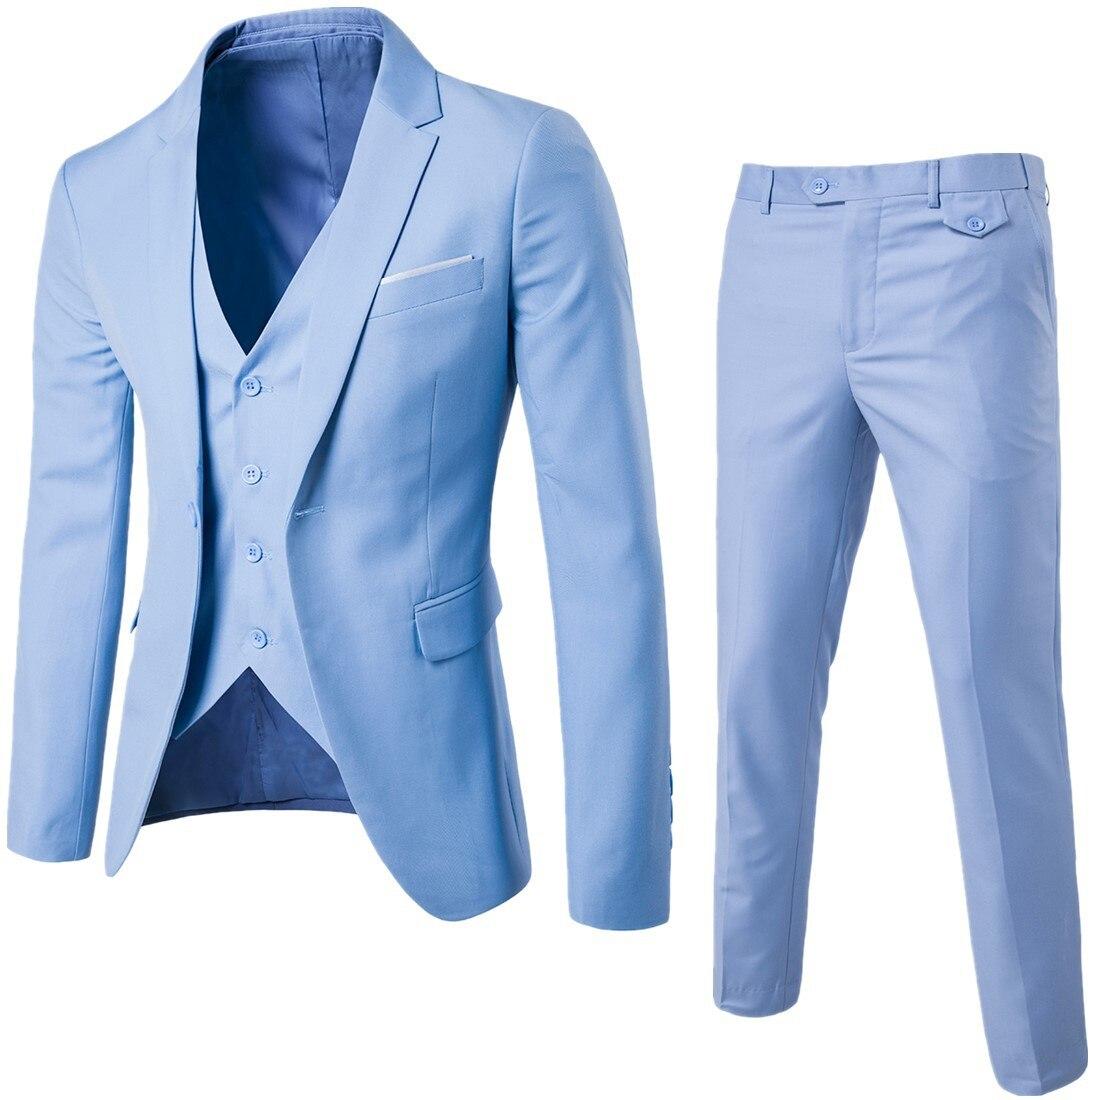 MEN'S Suit Set Korean-style Slim Fit Three-piece Set Groom Formal Dress British Style Best Man Formal Wear Marriage Suit Jacket